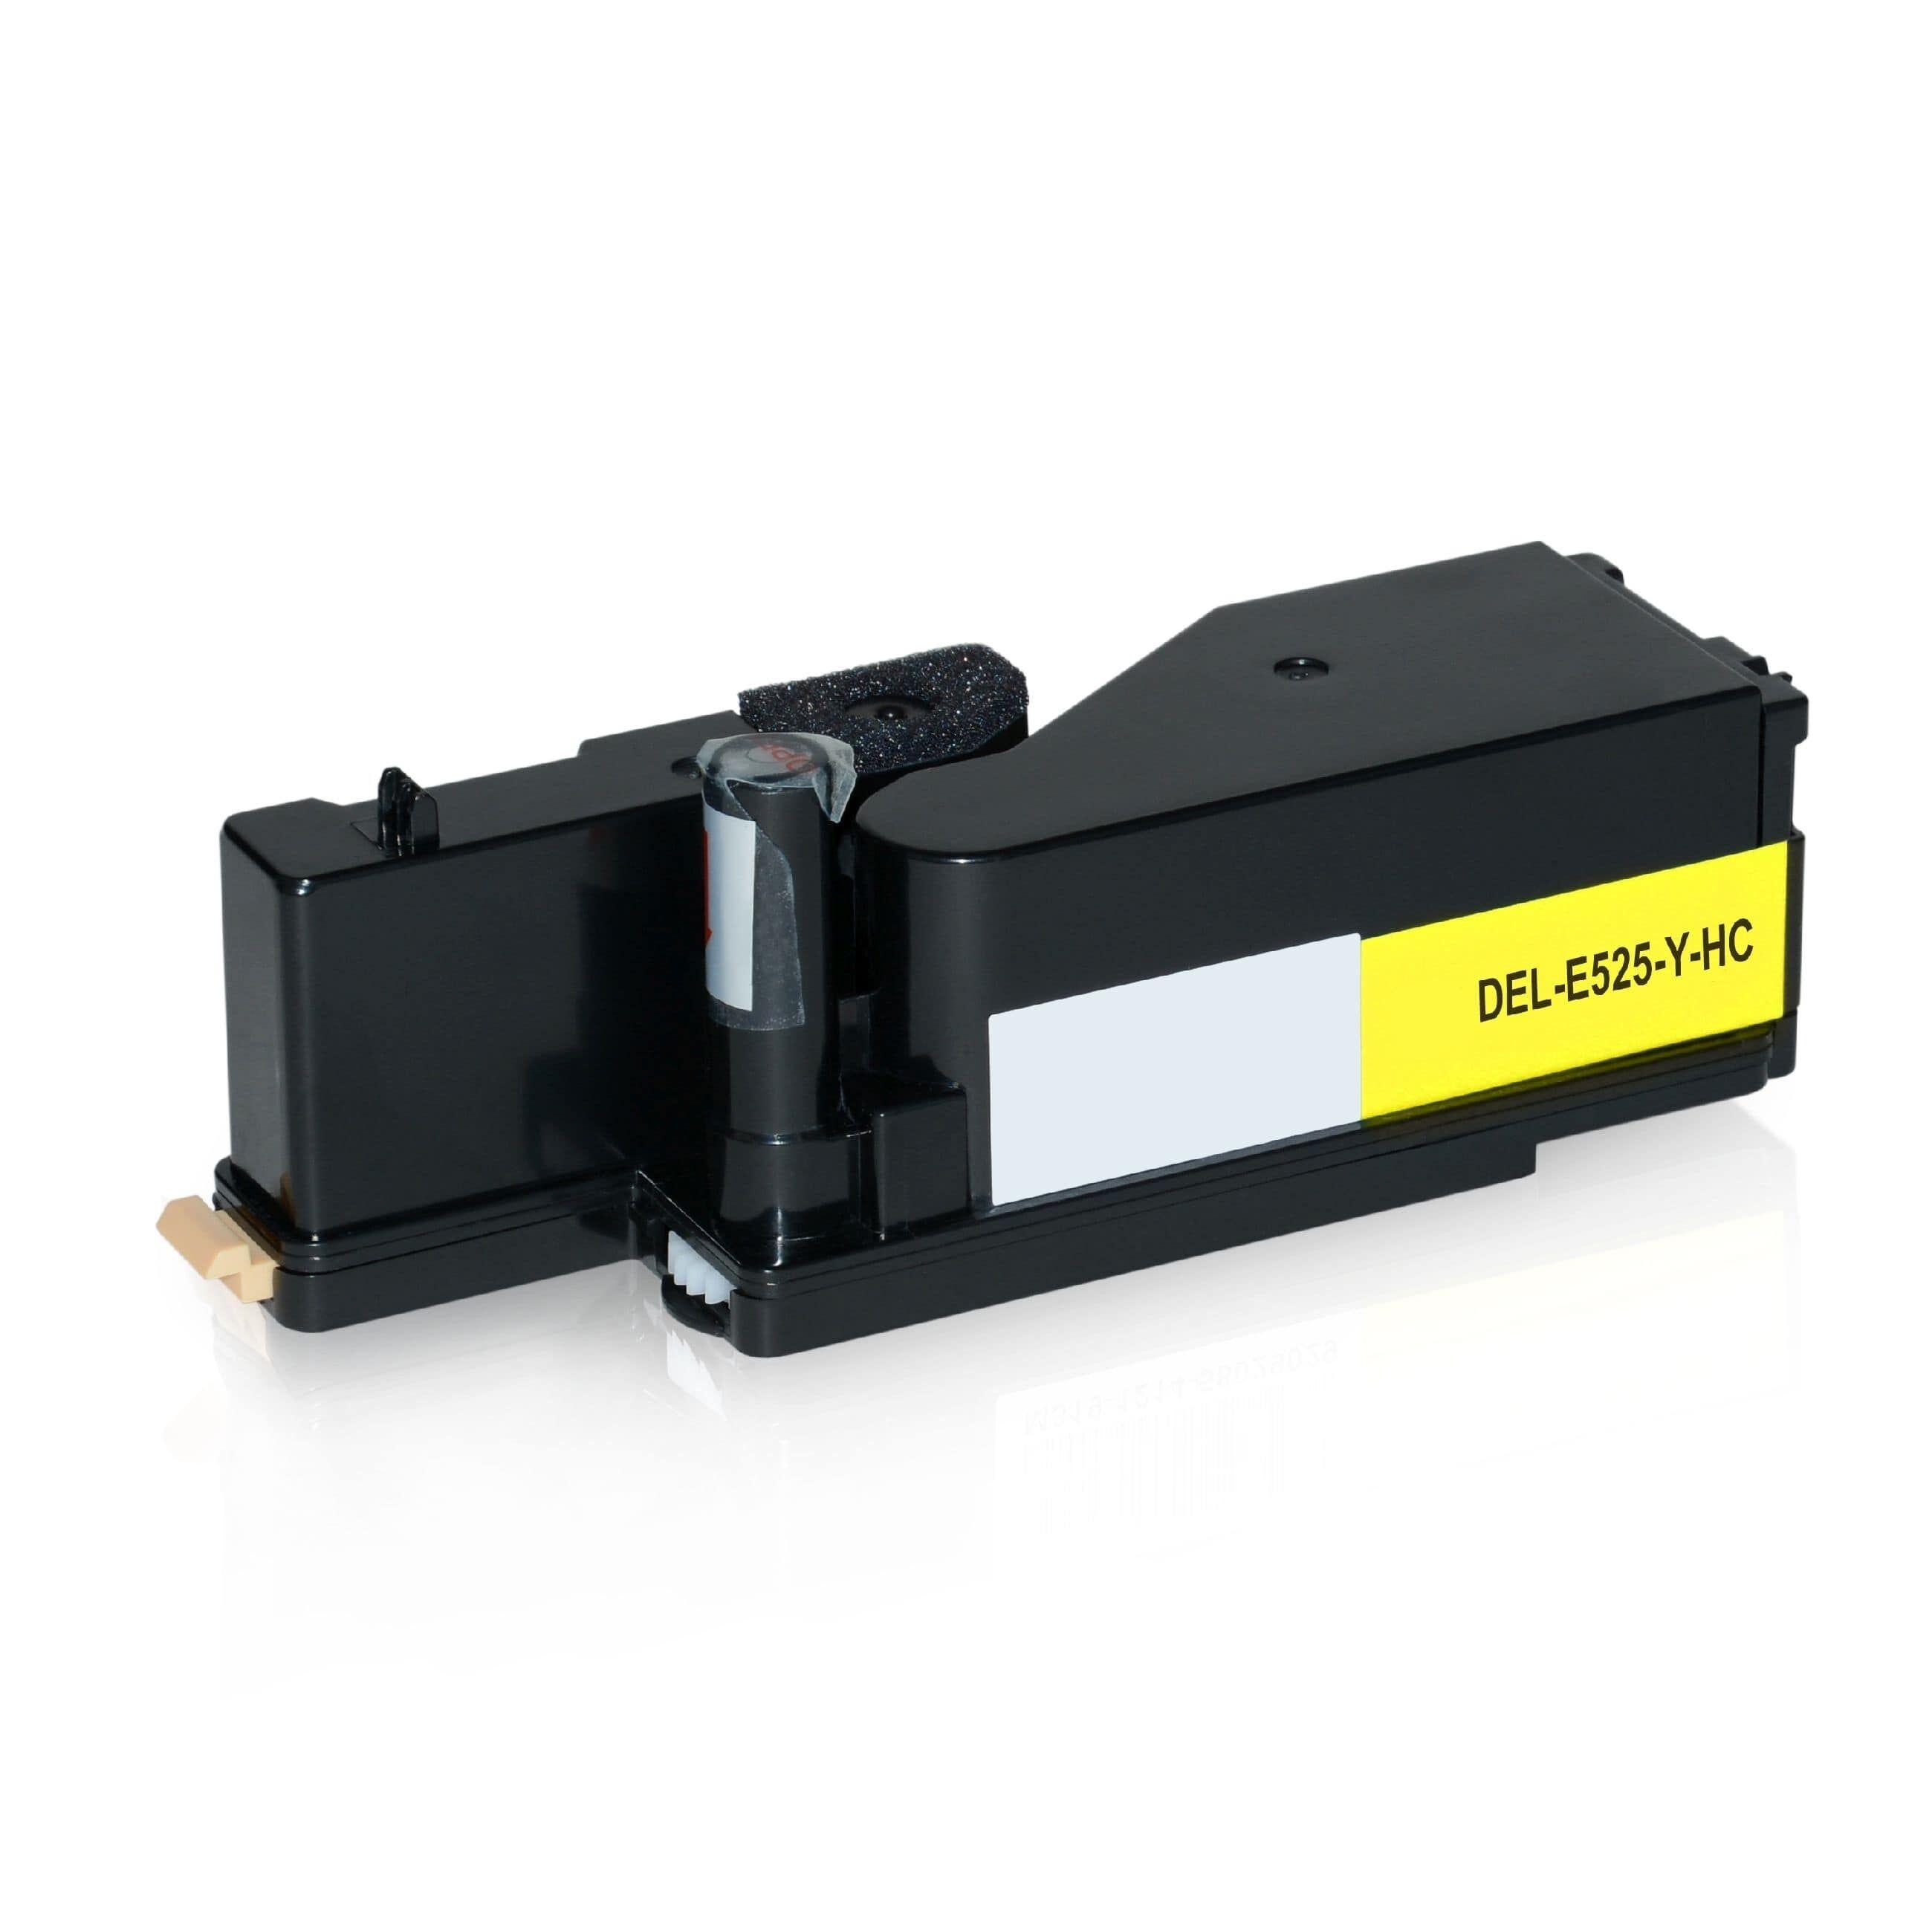 Dell Cartouche de Toner pour Dell 593BBLV / MWR7R jaune compatible (de marque ASC)